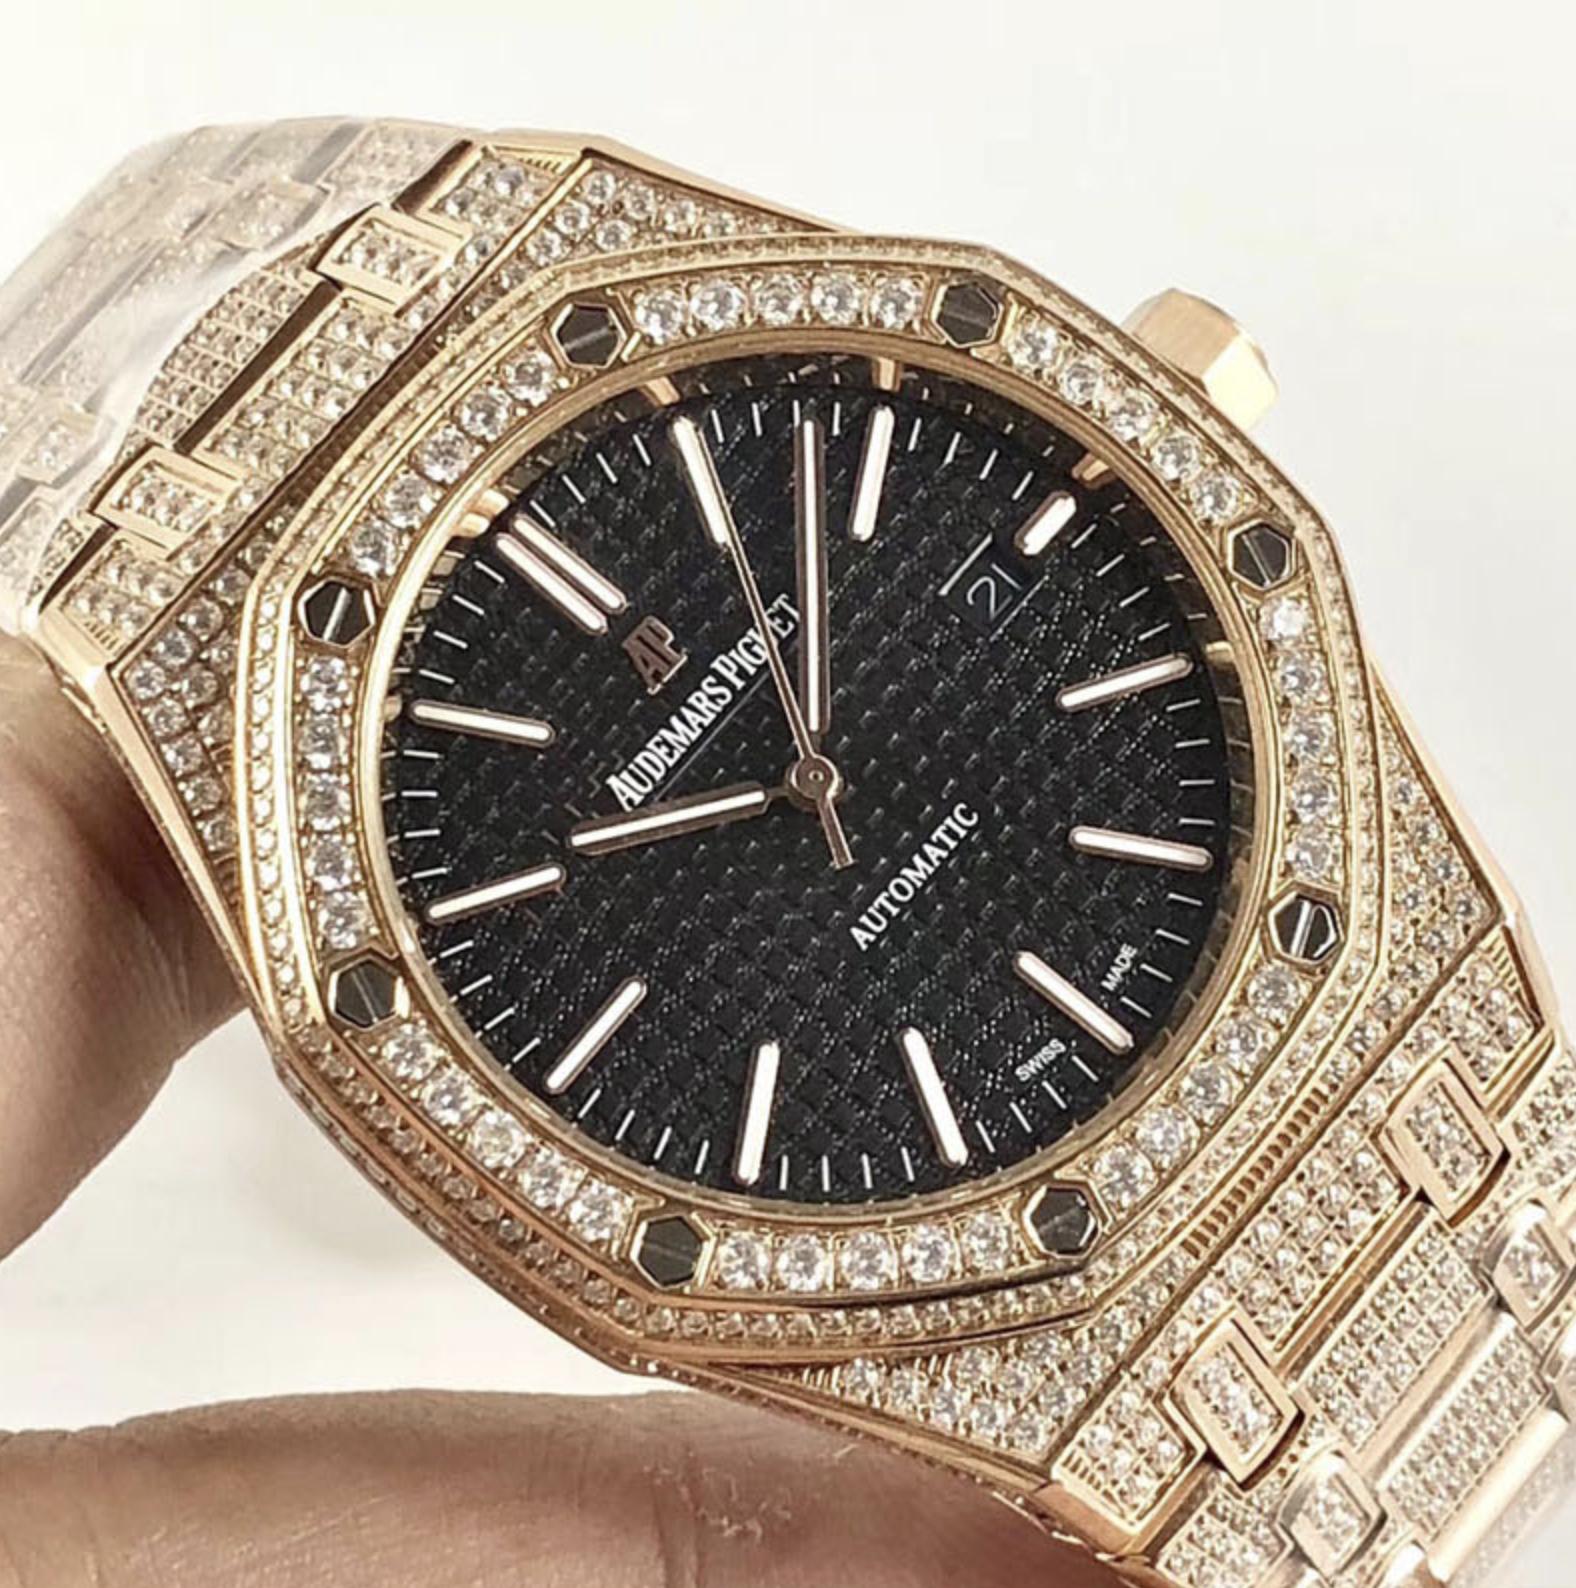 Audemars piguet replica royal oak 15400ST 41mm rose gold full paved diamonds black dial